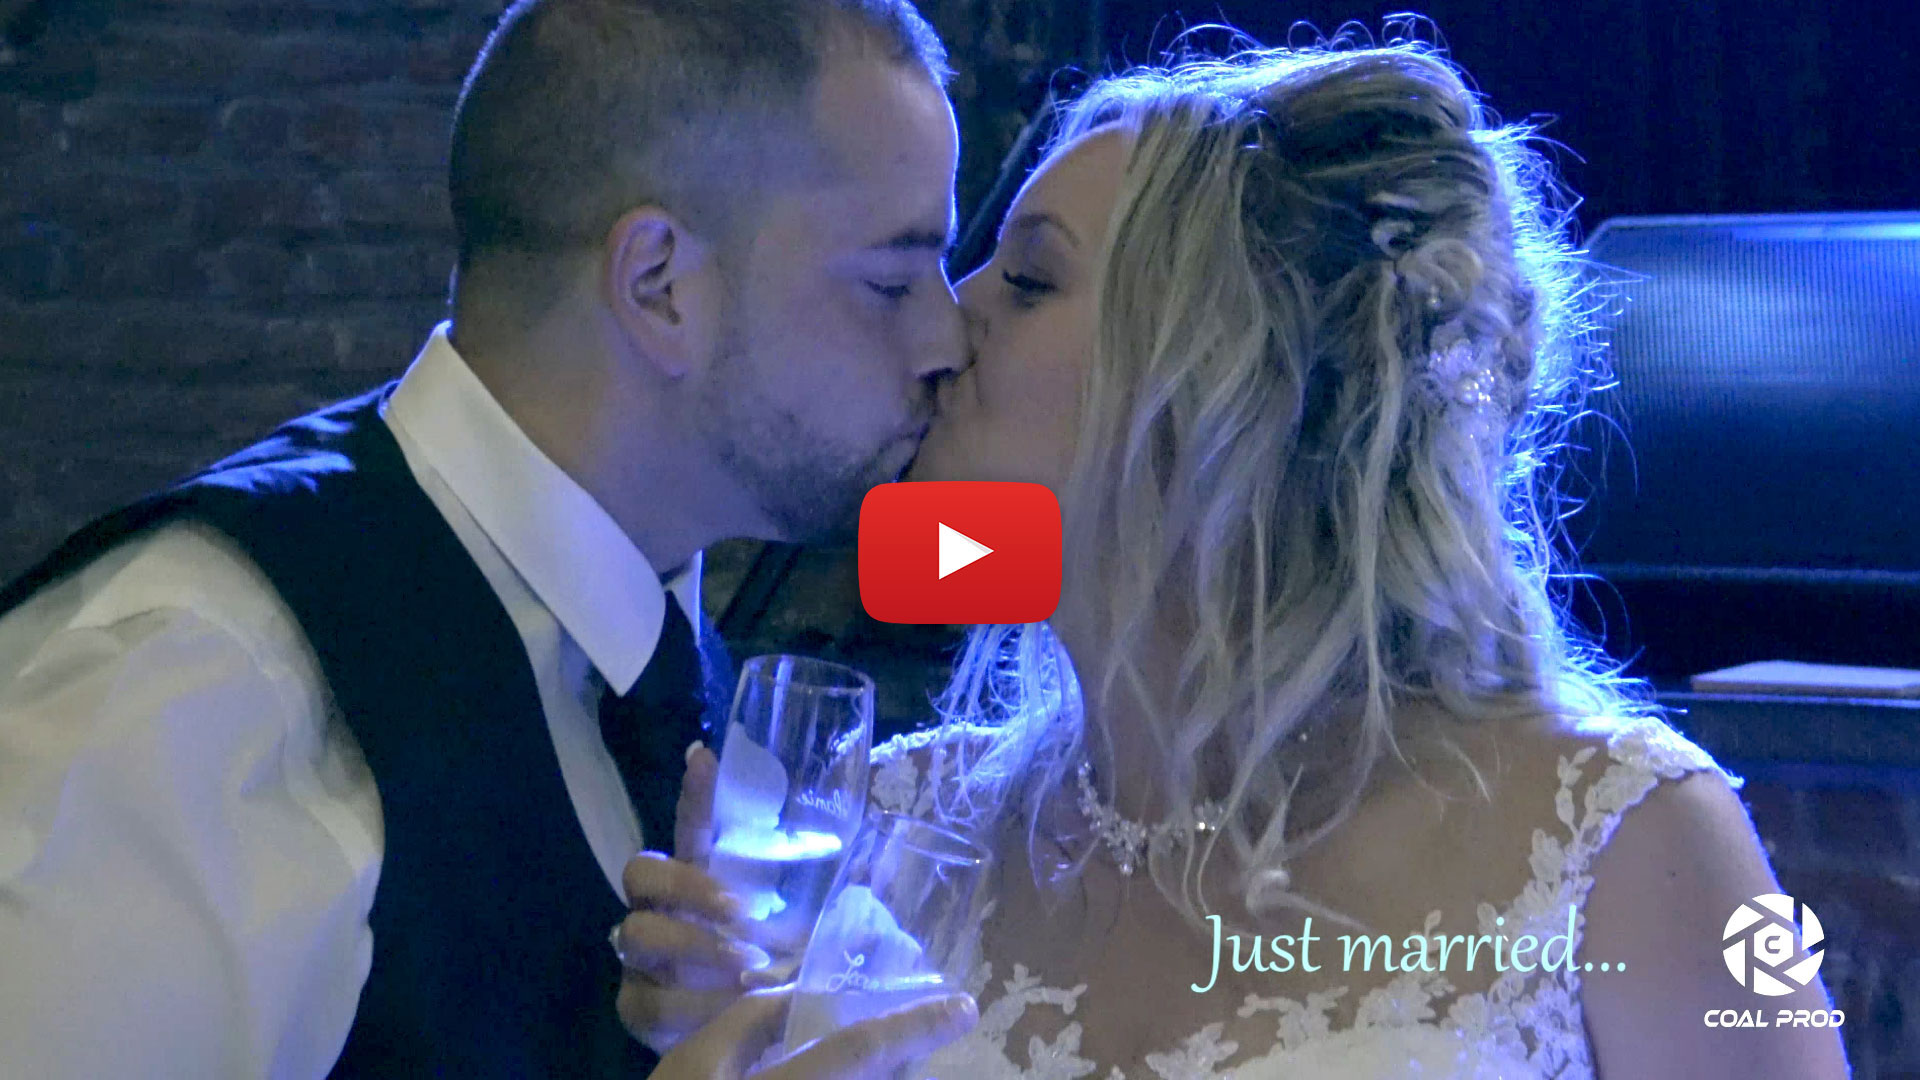 mariage-coal-prod-video.jpg